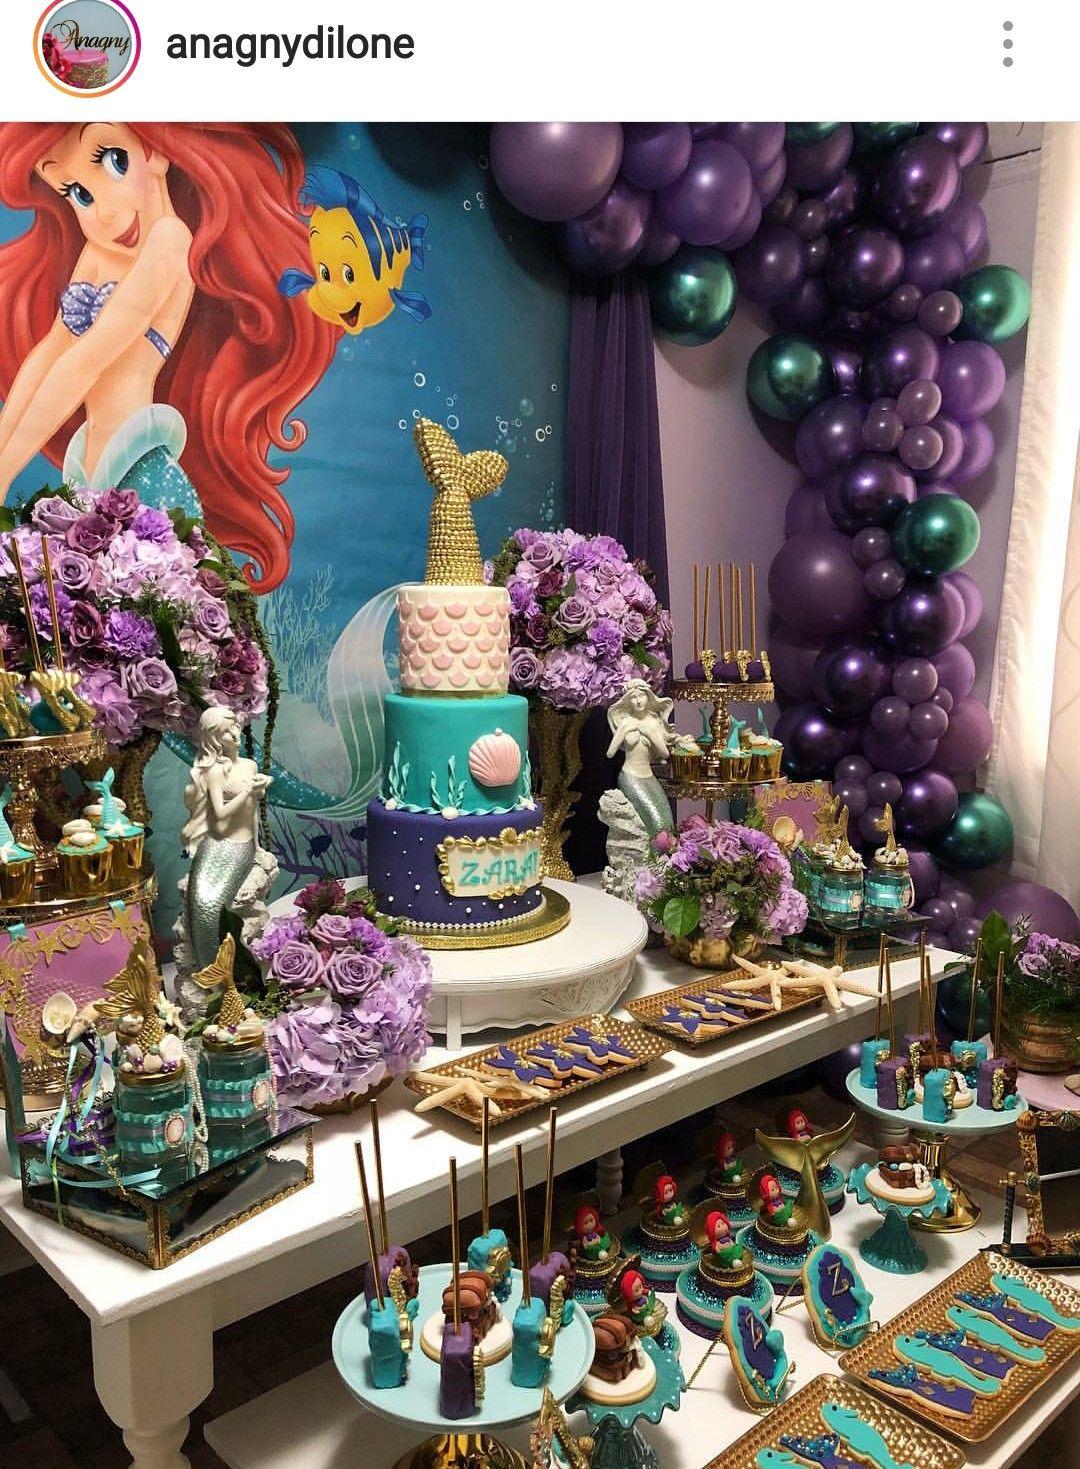 The Little Mermaid Theme Dessert Table And Decor Fiesta Tematica Sirenita Fiestas Tematicas Fiesta Cumpleanos